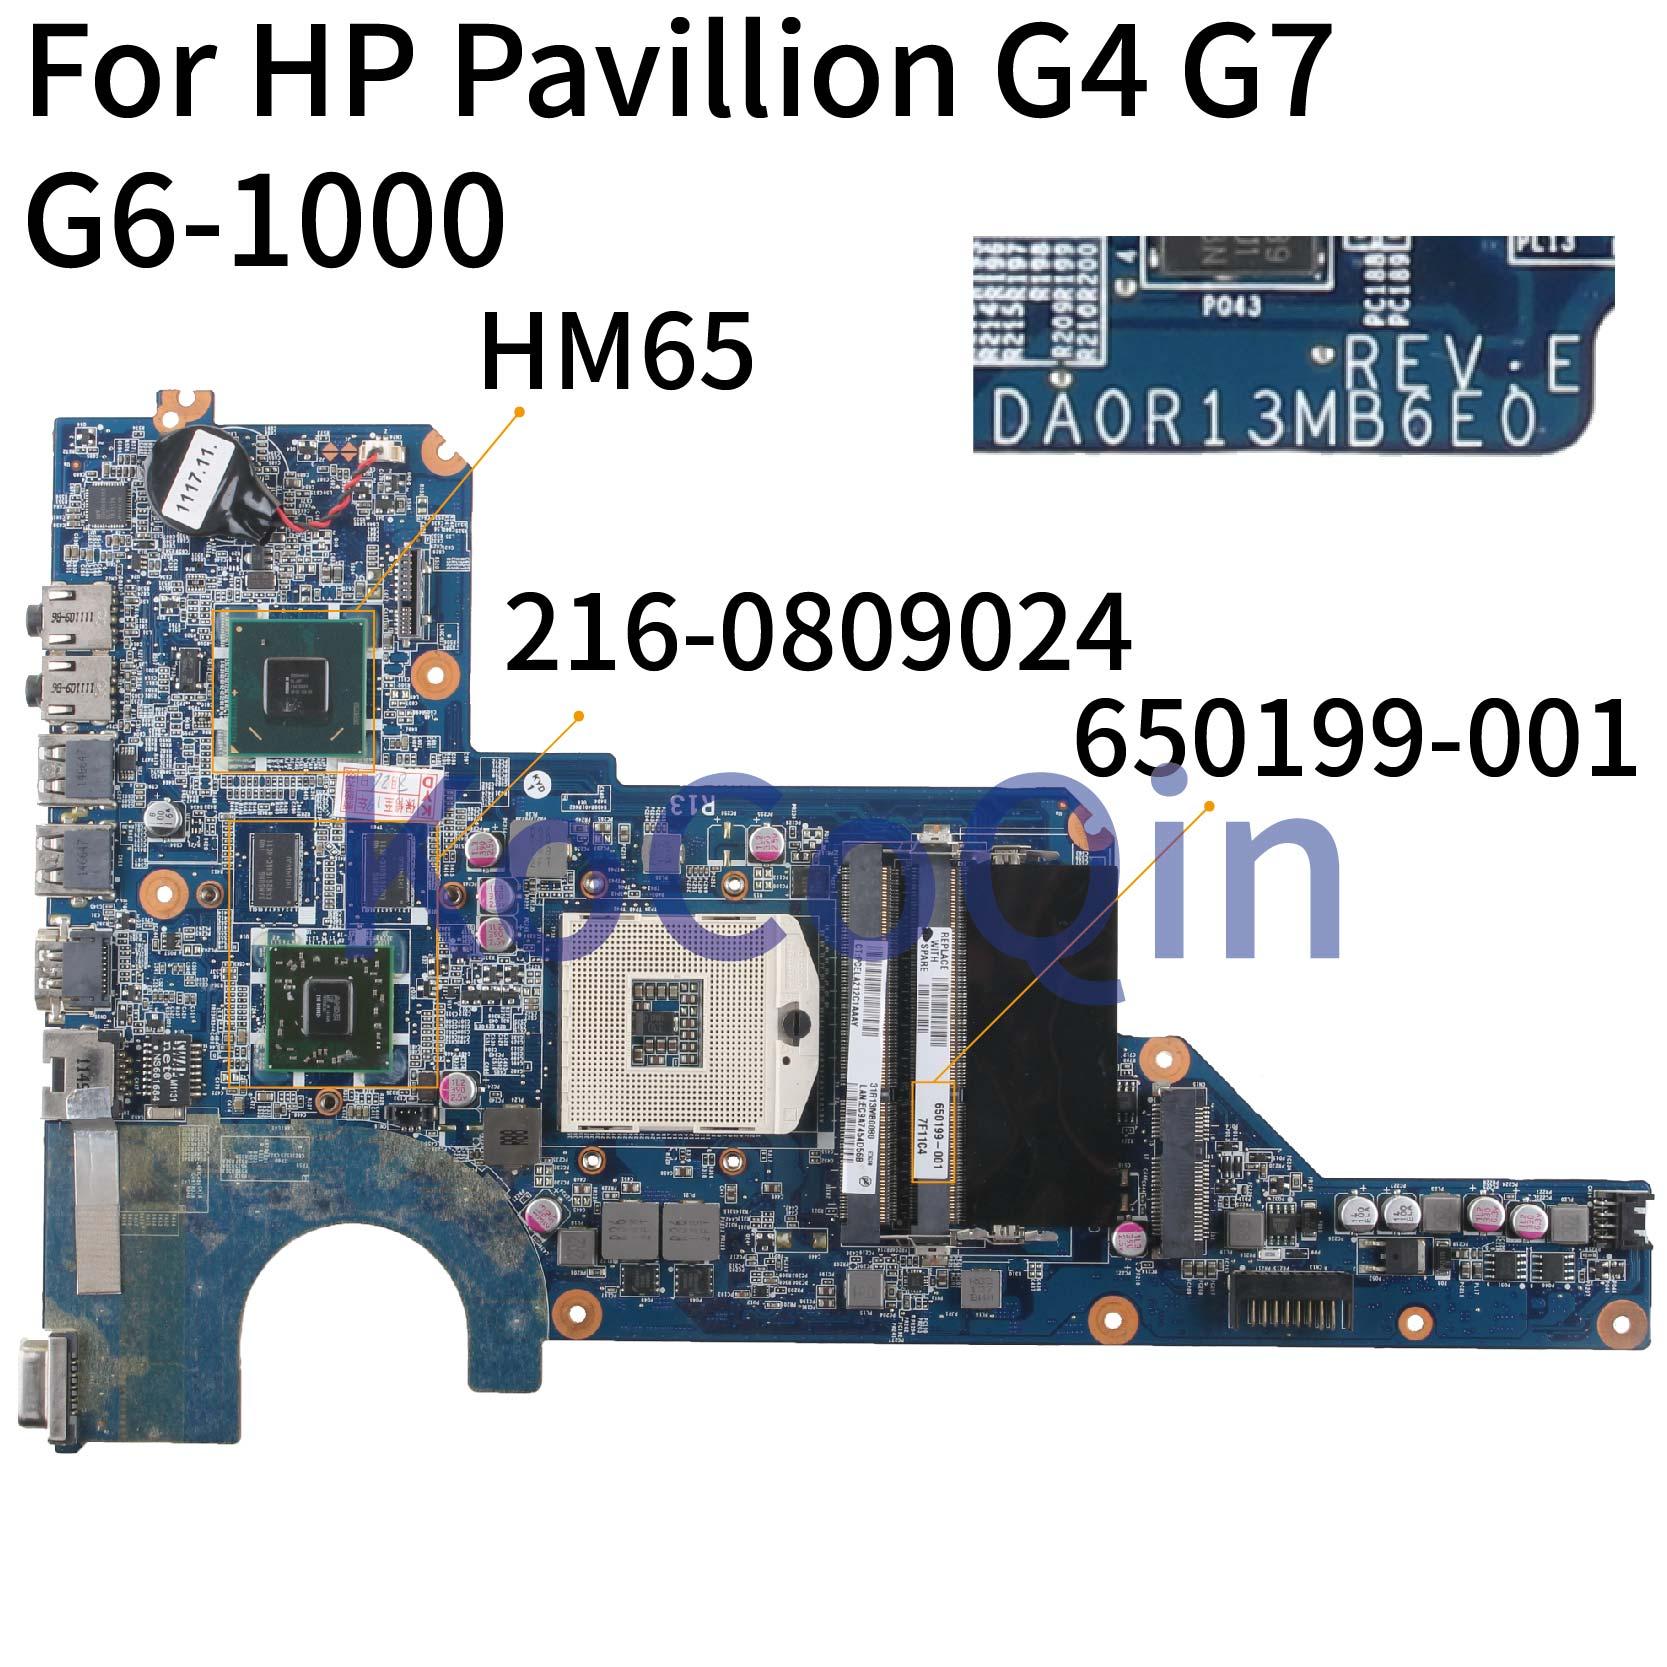 KoCoQin laptop Motherboard Para HP Pavilion G4 G4-1000 G6 HD6470 Mainboard 650199-001 636375-001 DA0R13MB6E1 216- 0809024 HM65